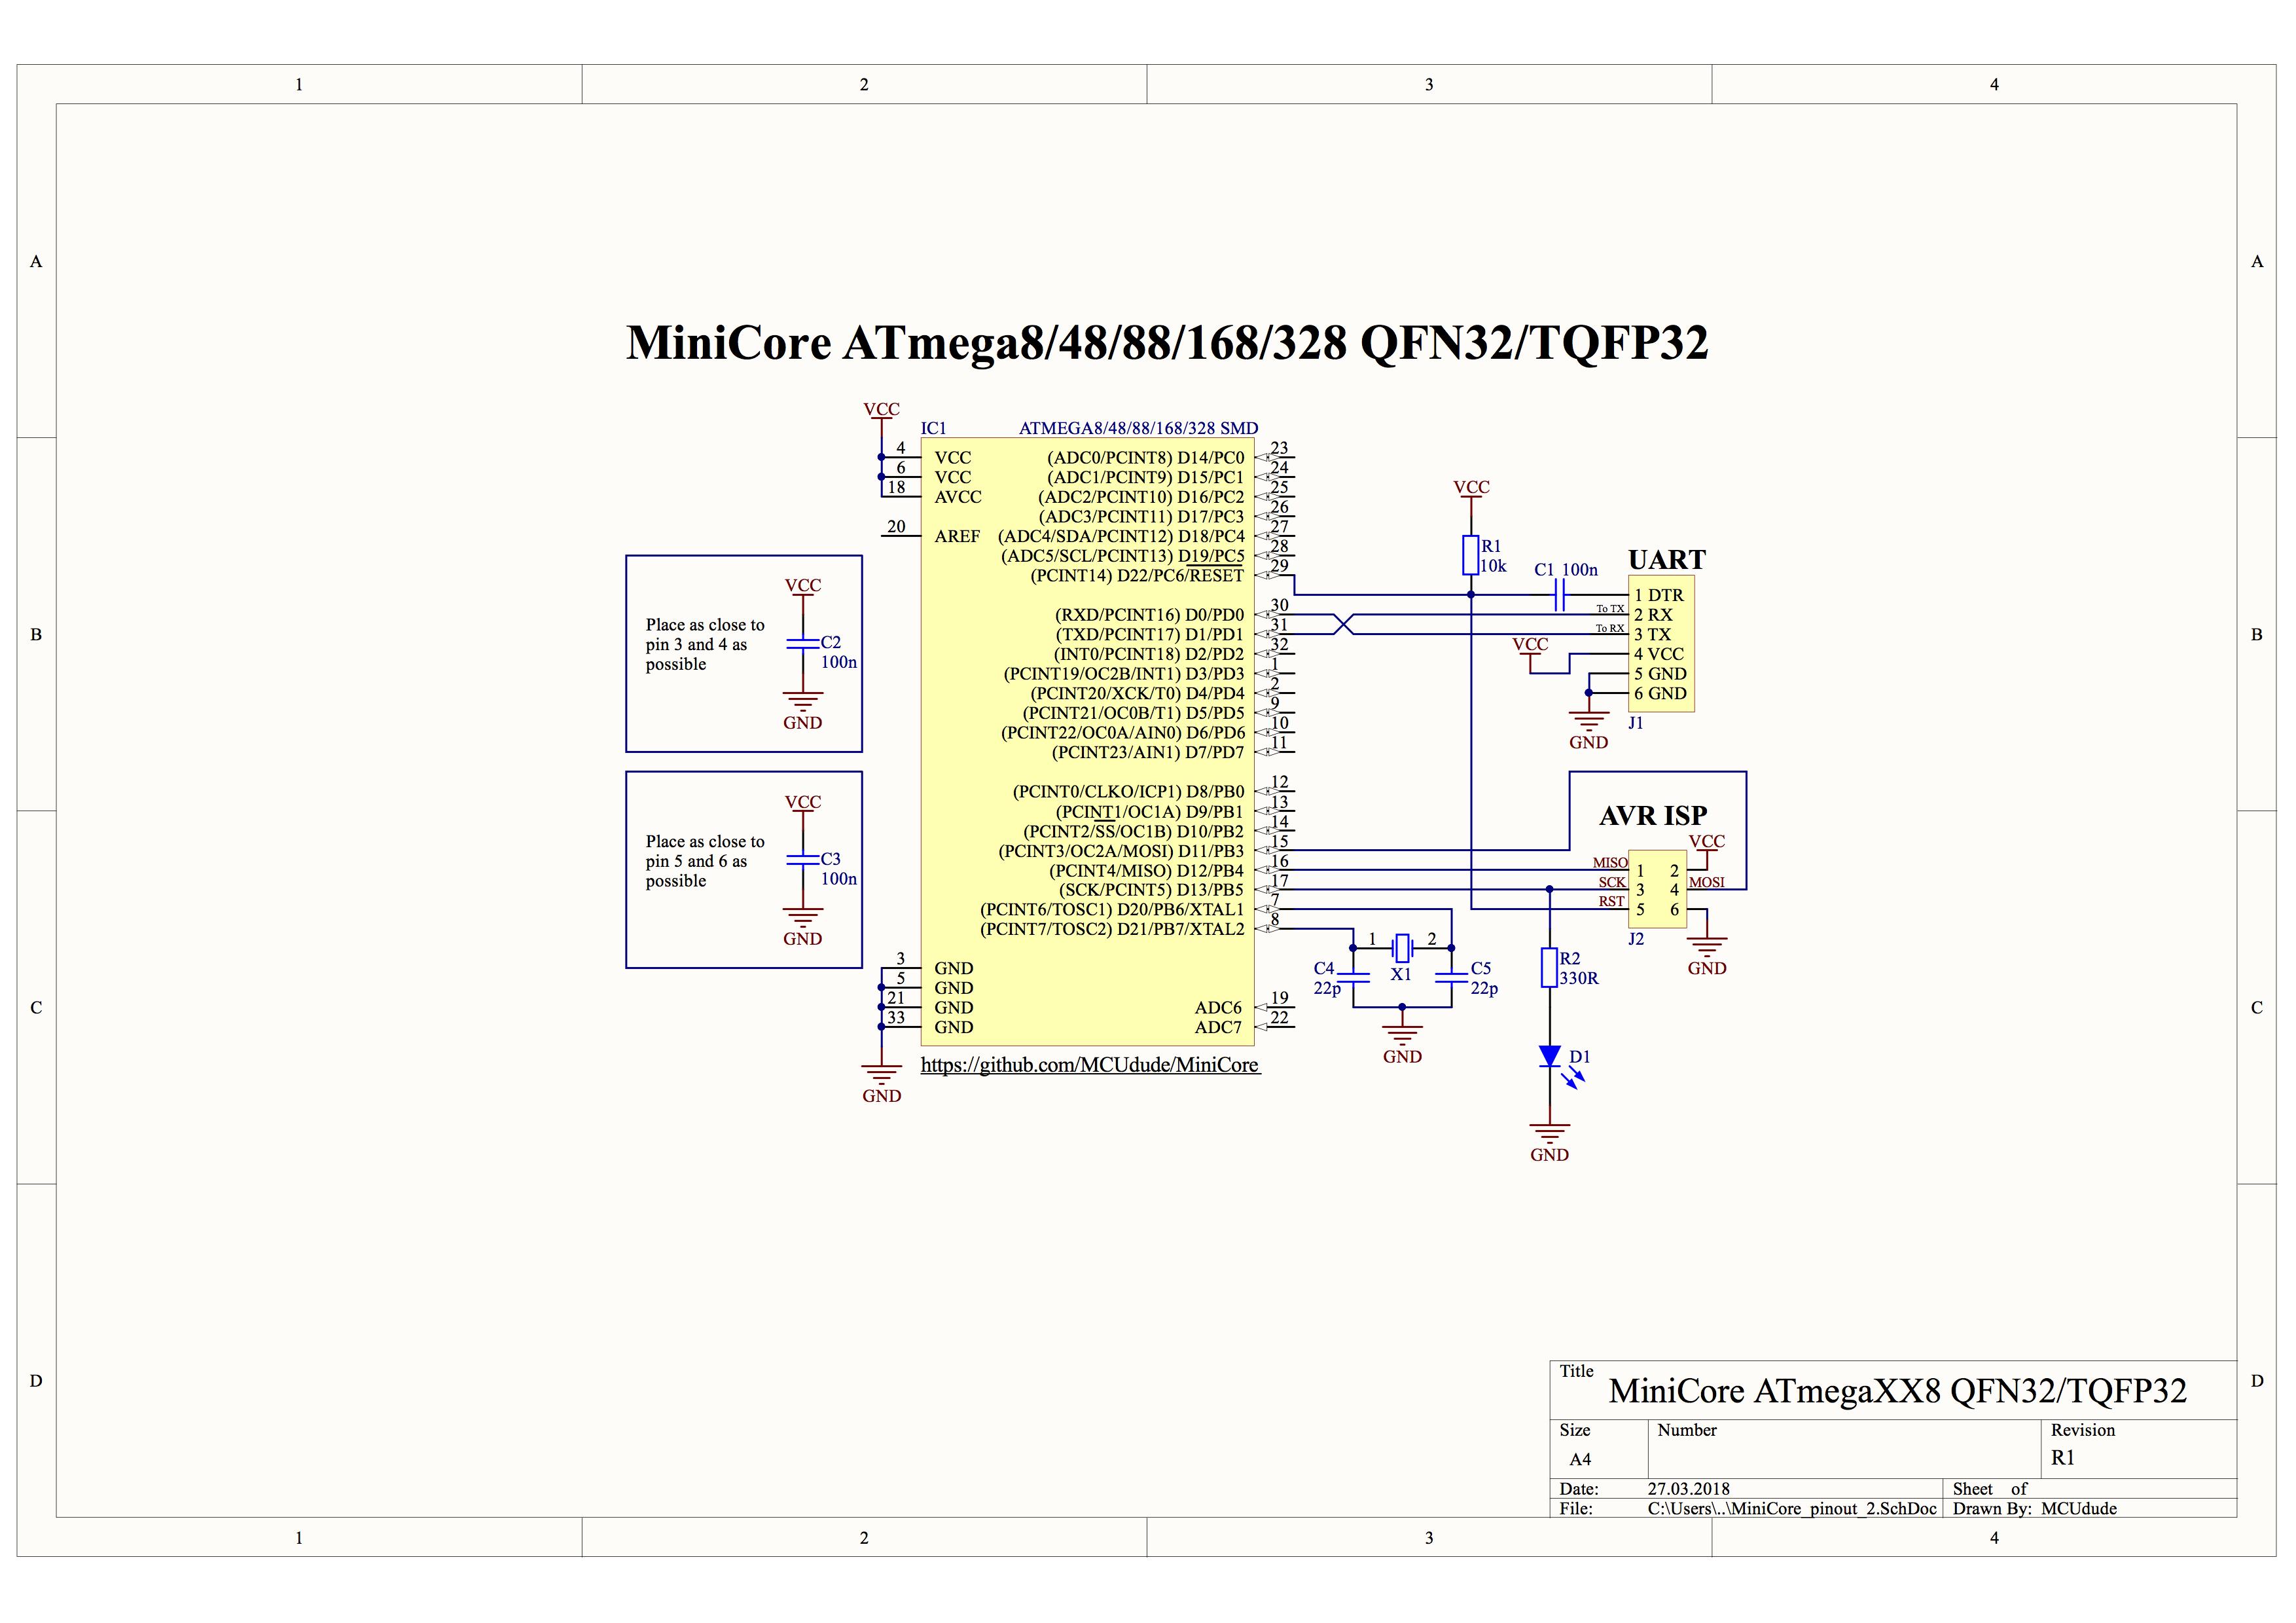 DIP-28 package ATmega8/48/88/168/328, TQFP-32 SMD package ATmega8/48/88/168/328,  TQFP-32 SMD package ATmega48/88/168/328PB